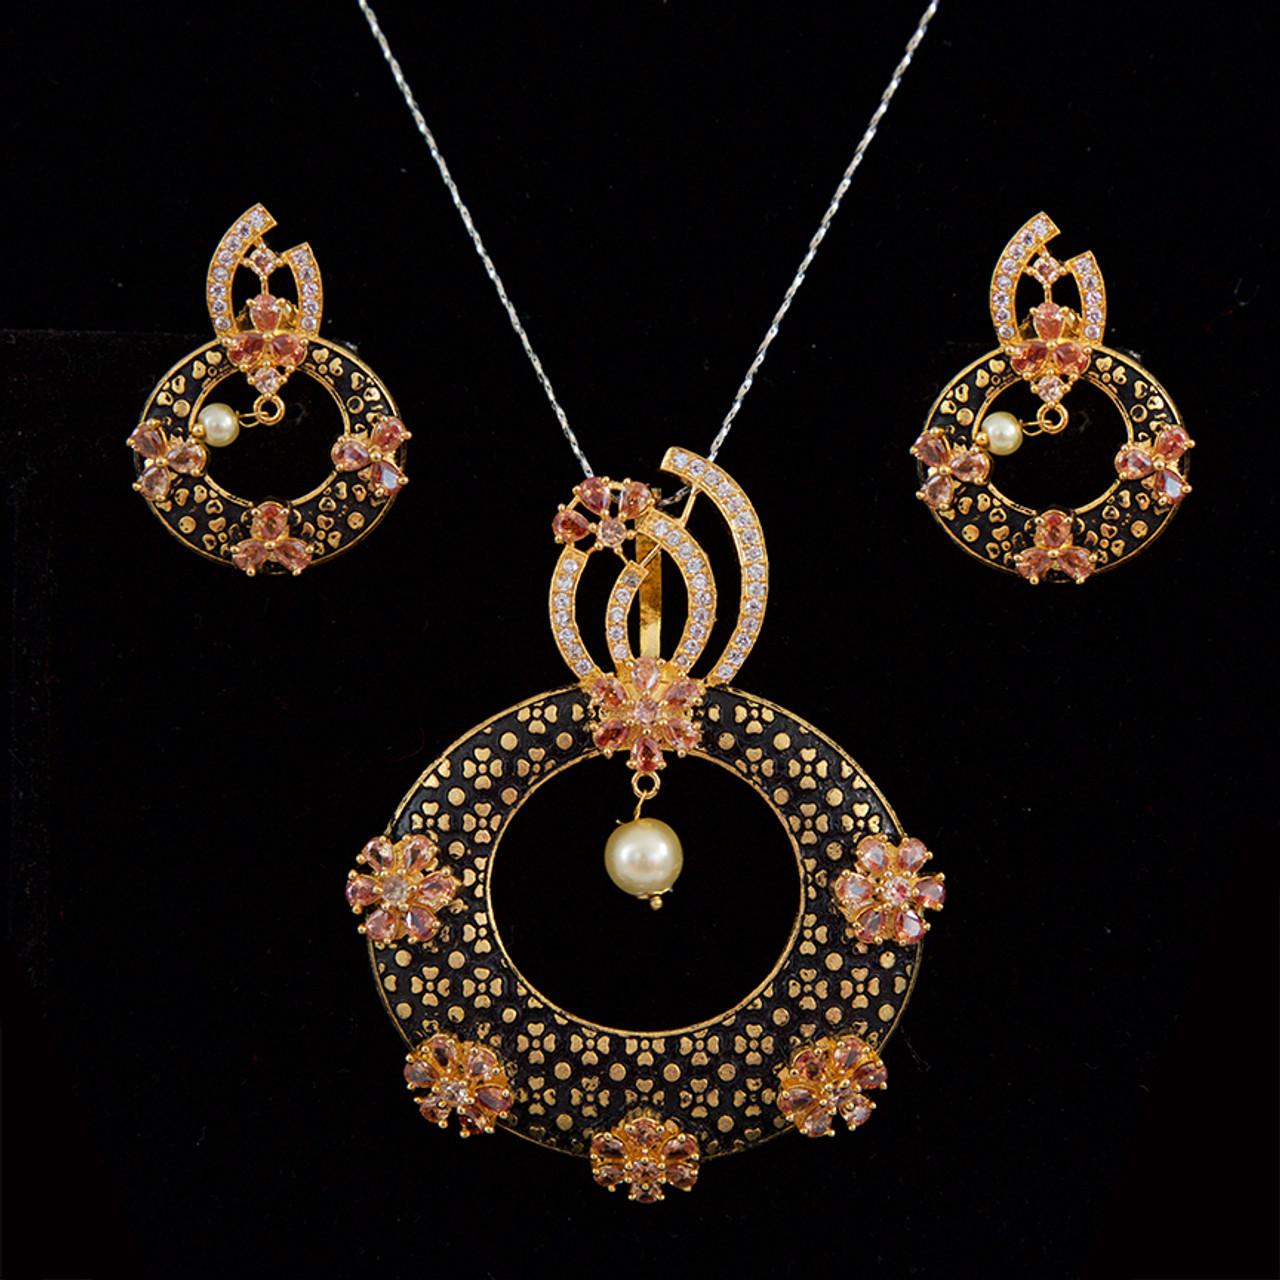 Antique Meenakari Pearl Pendant Earrings Set Fashion Jewellery